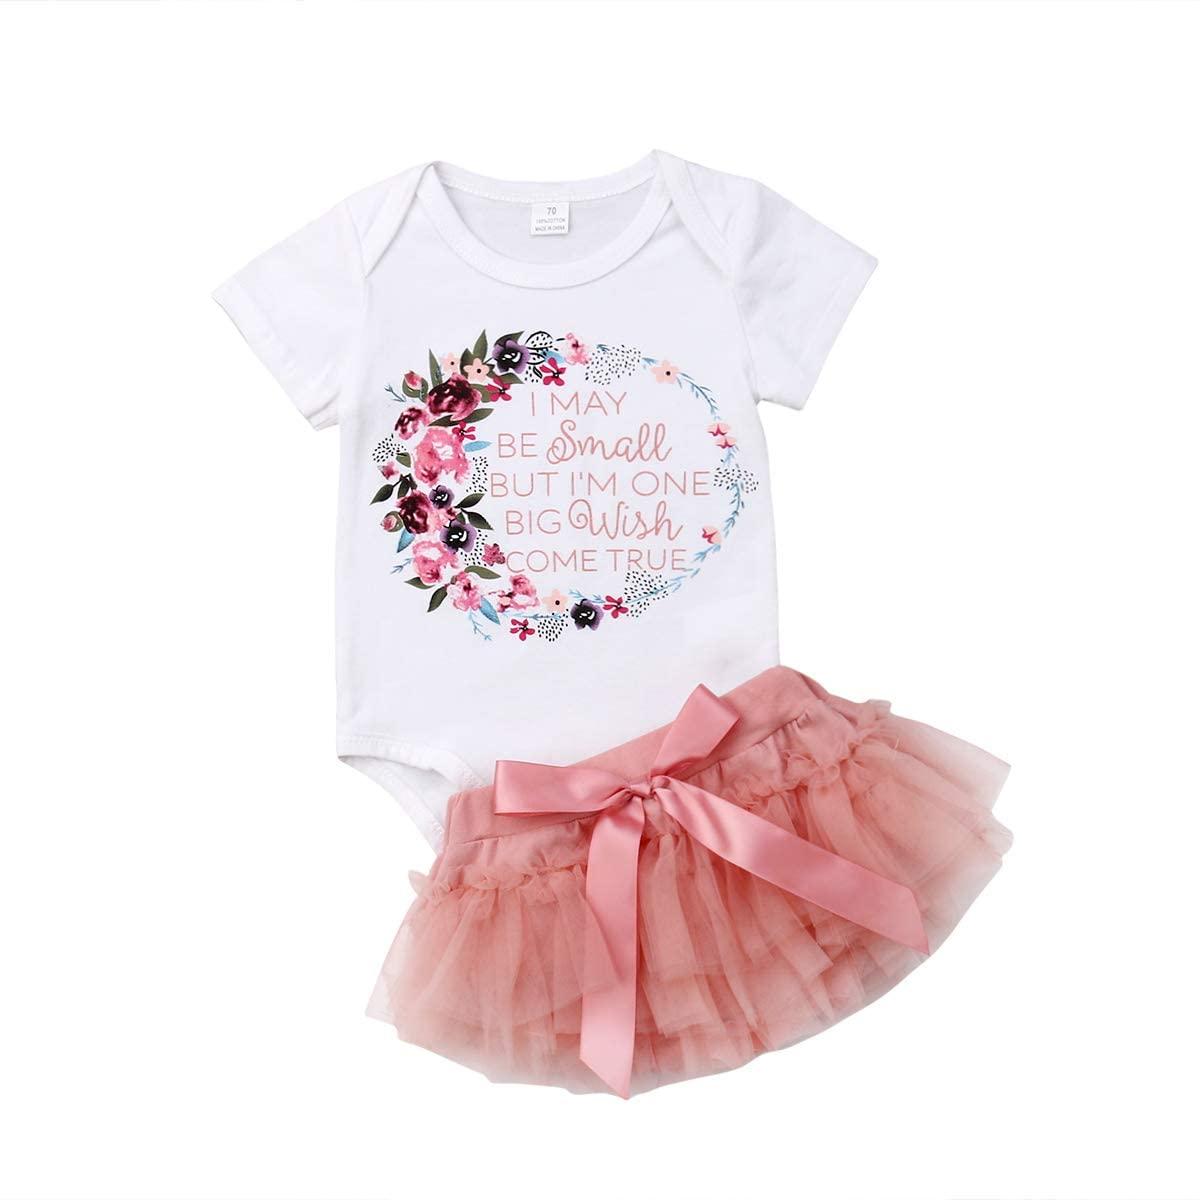 2Pcs/Set Newborn Infant Baby Girl Floral Bodysuit Romper Top+Tutu Skirt Shorts Summer Outfit